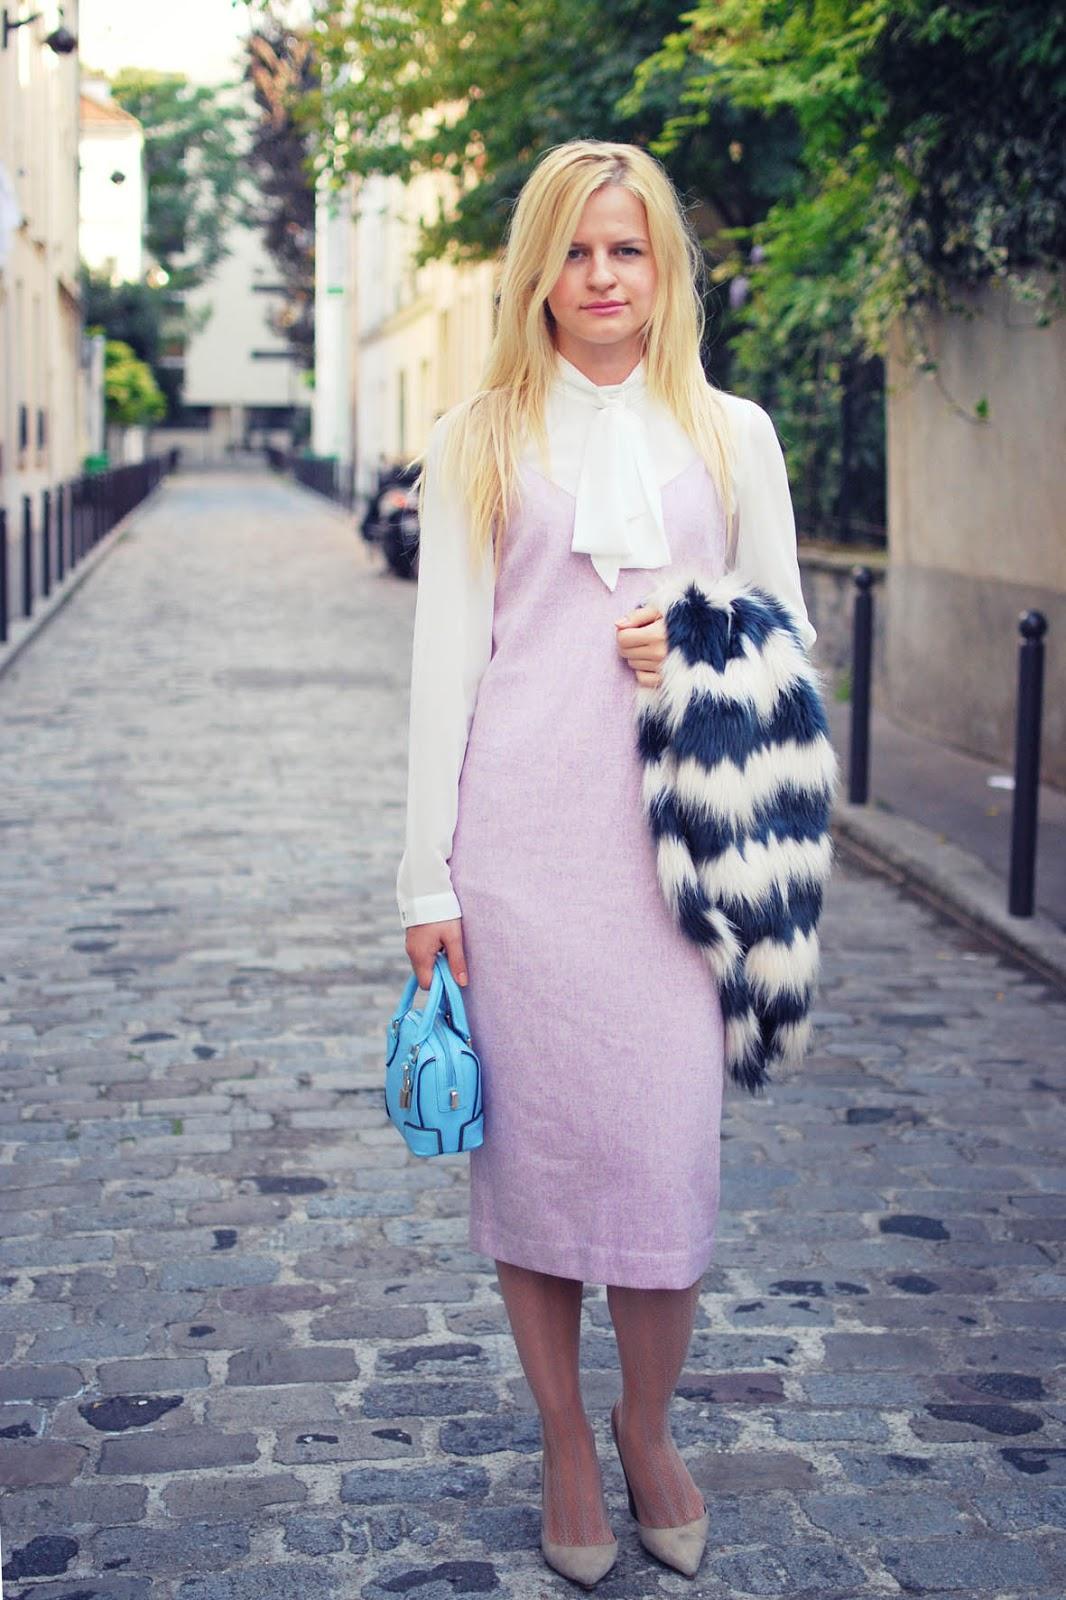 модный лук, Ирина Павлова блог, блог коста мода, ла мода,costa de la mdoa,